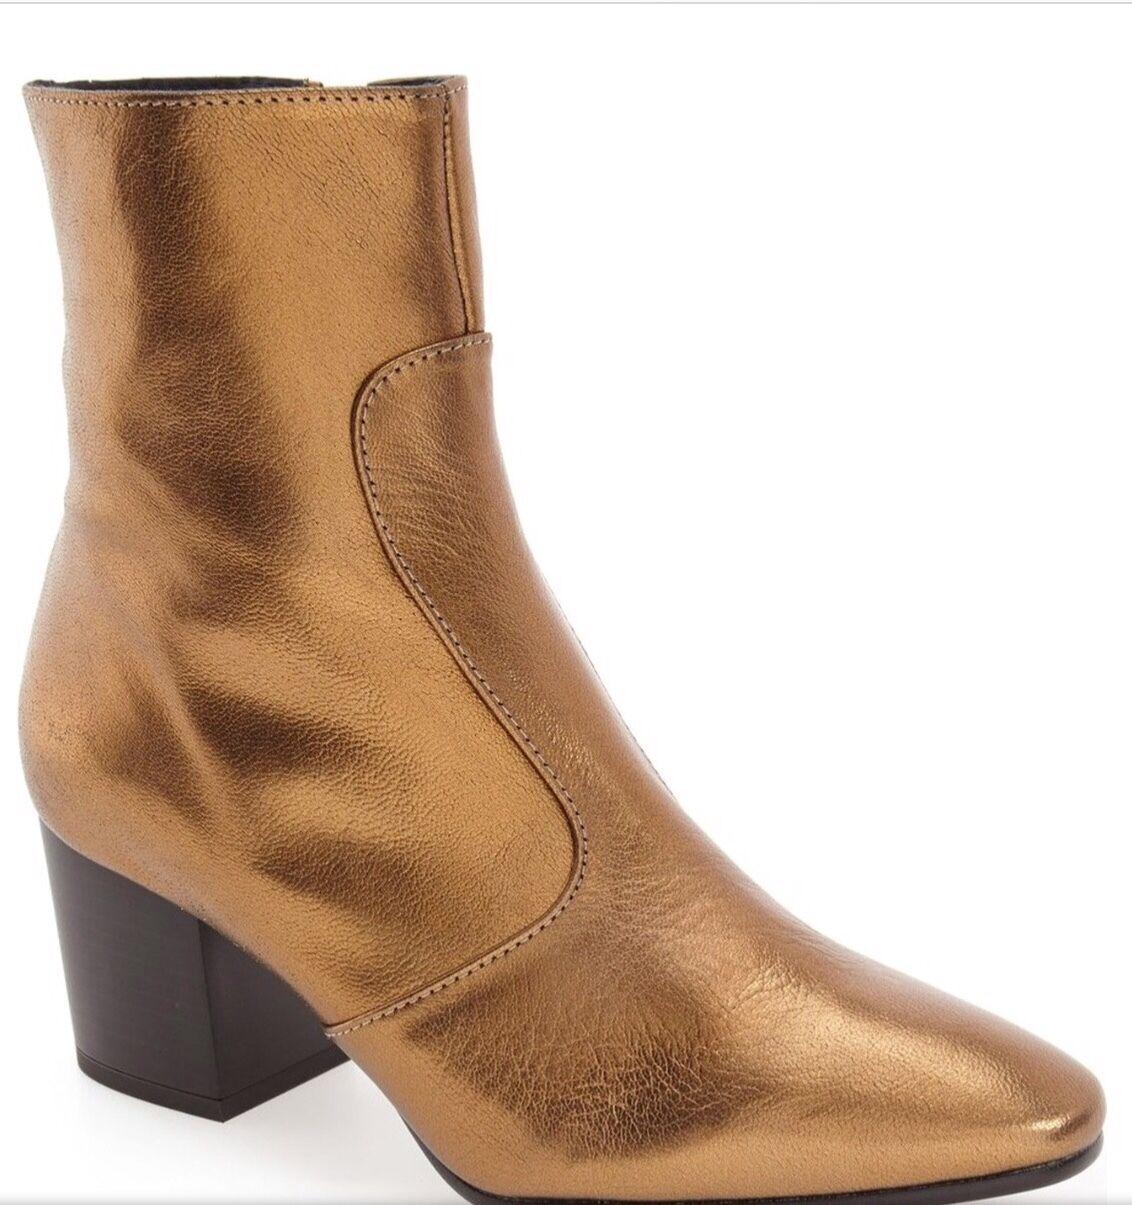 Topshop Damenschuhe Mustard Bronze Metallic Leder Ankle Stiefel, Sz's Us. 5.5 $ 69.50